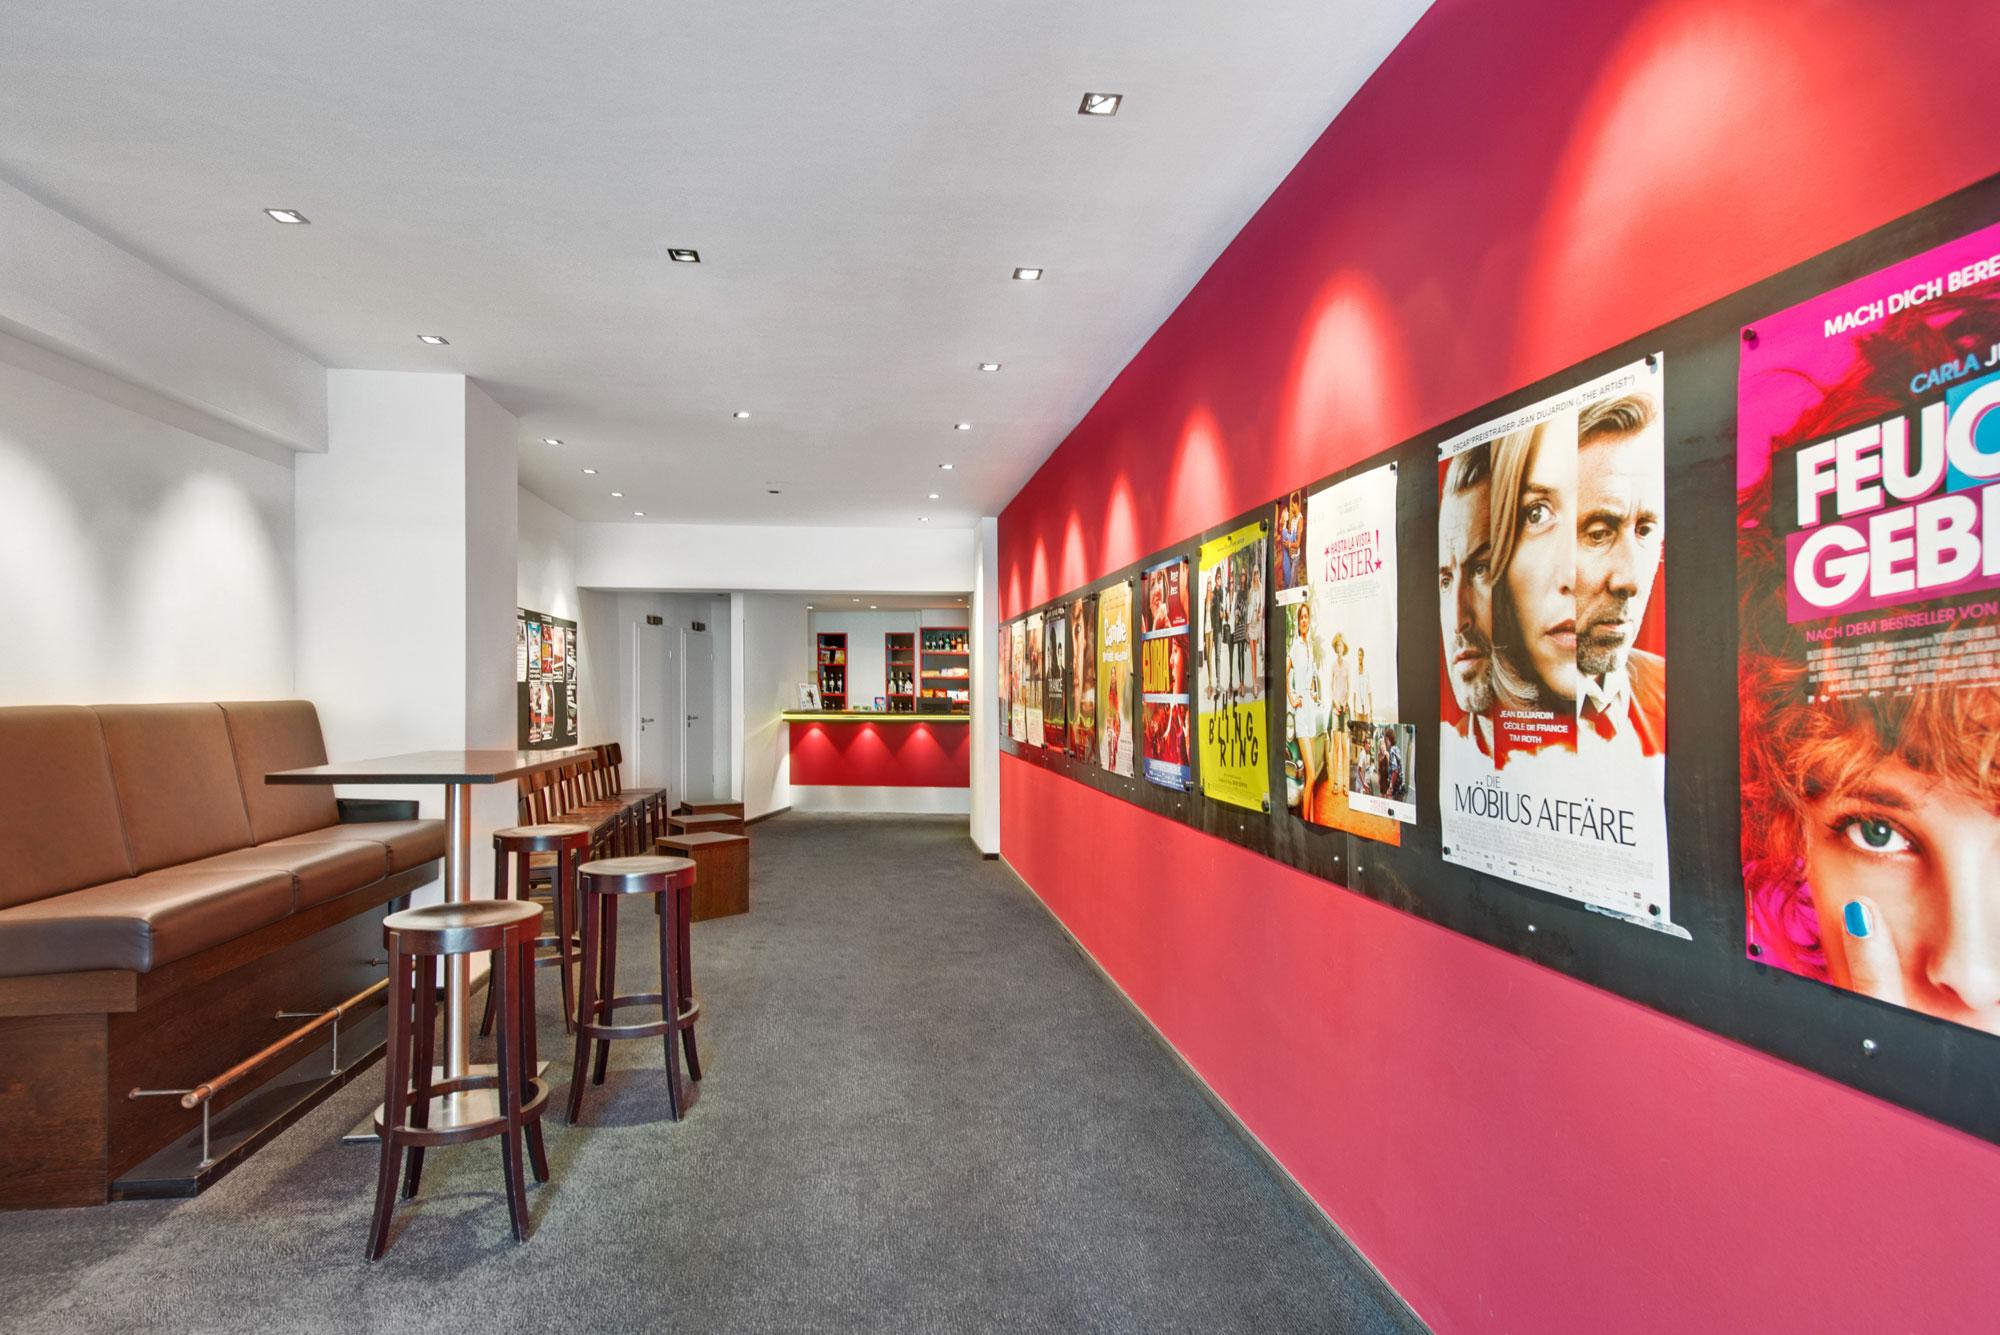 Das Foyer des Filmtheater Hasetor